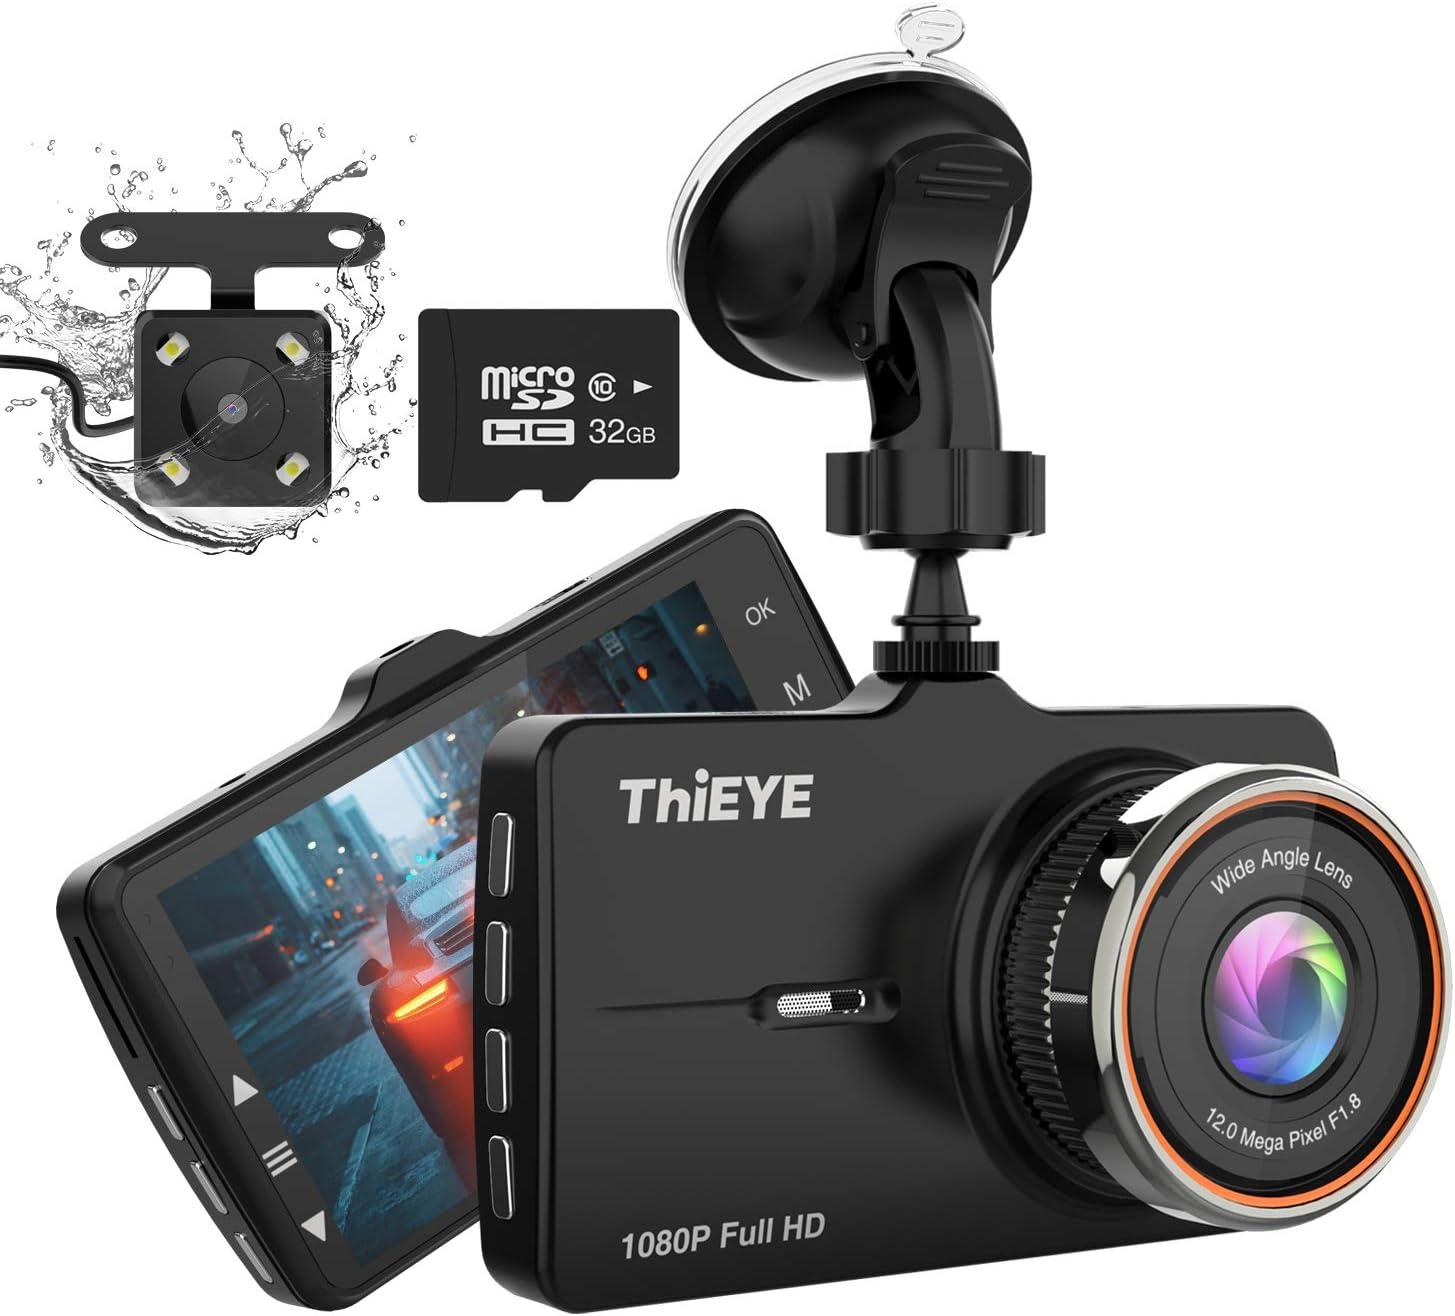 Thieye Dashcam Wifi Auto Kamera 1080p Full Hd Mit Elektronik